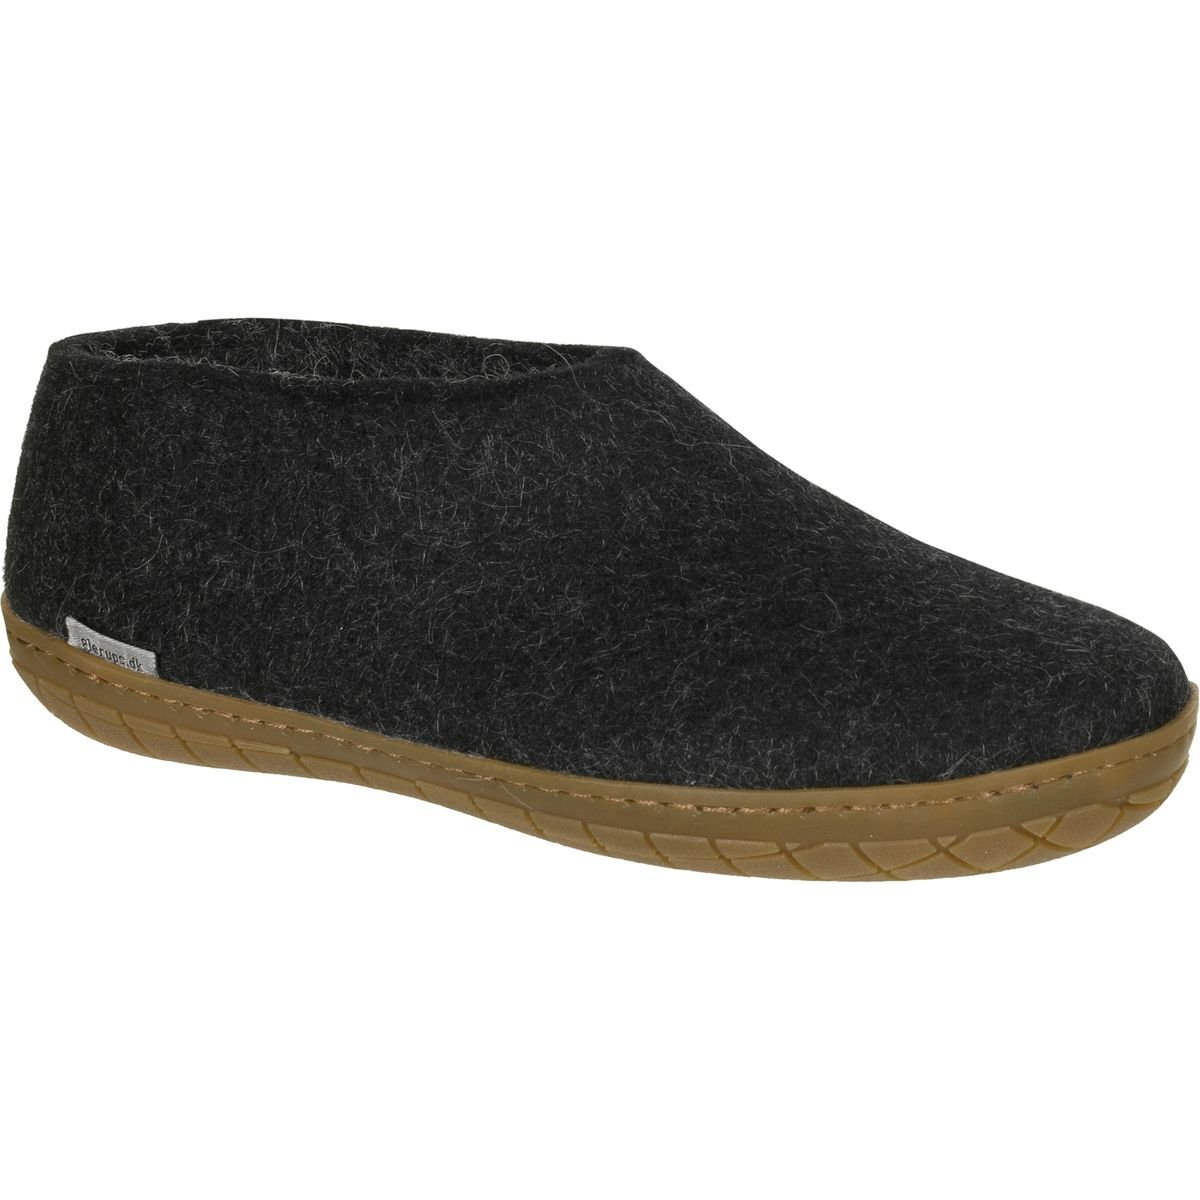 31041148d7fab Glerups AR Rubber Shoe